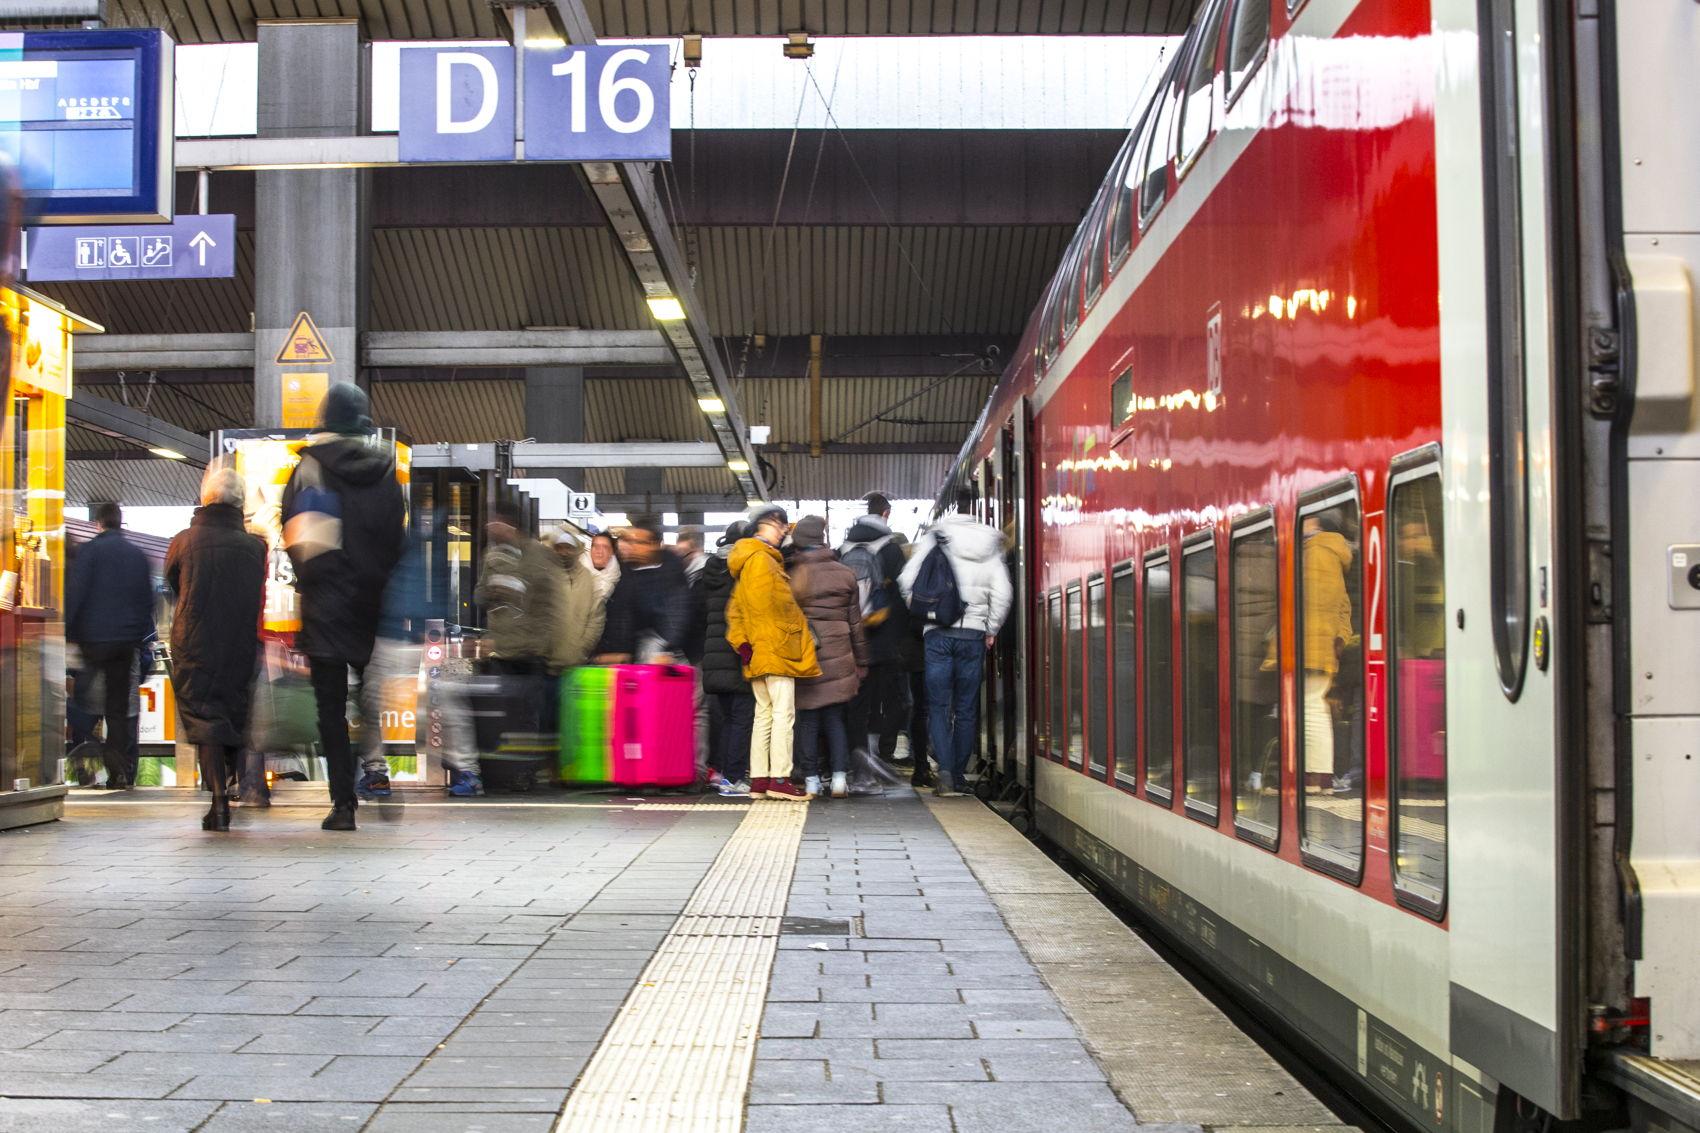 Station Düsseldorf